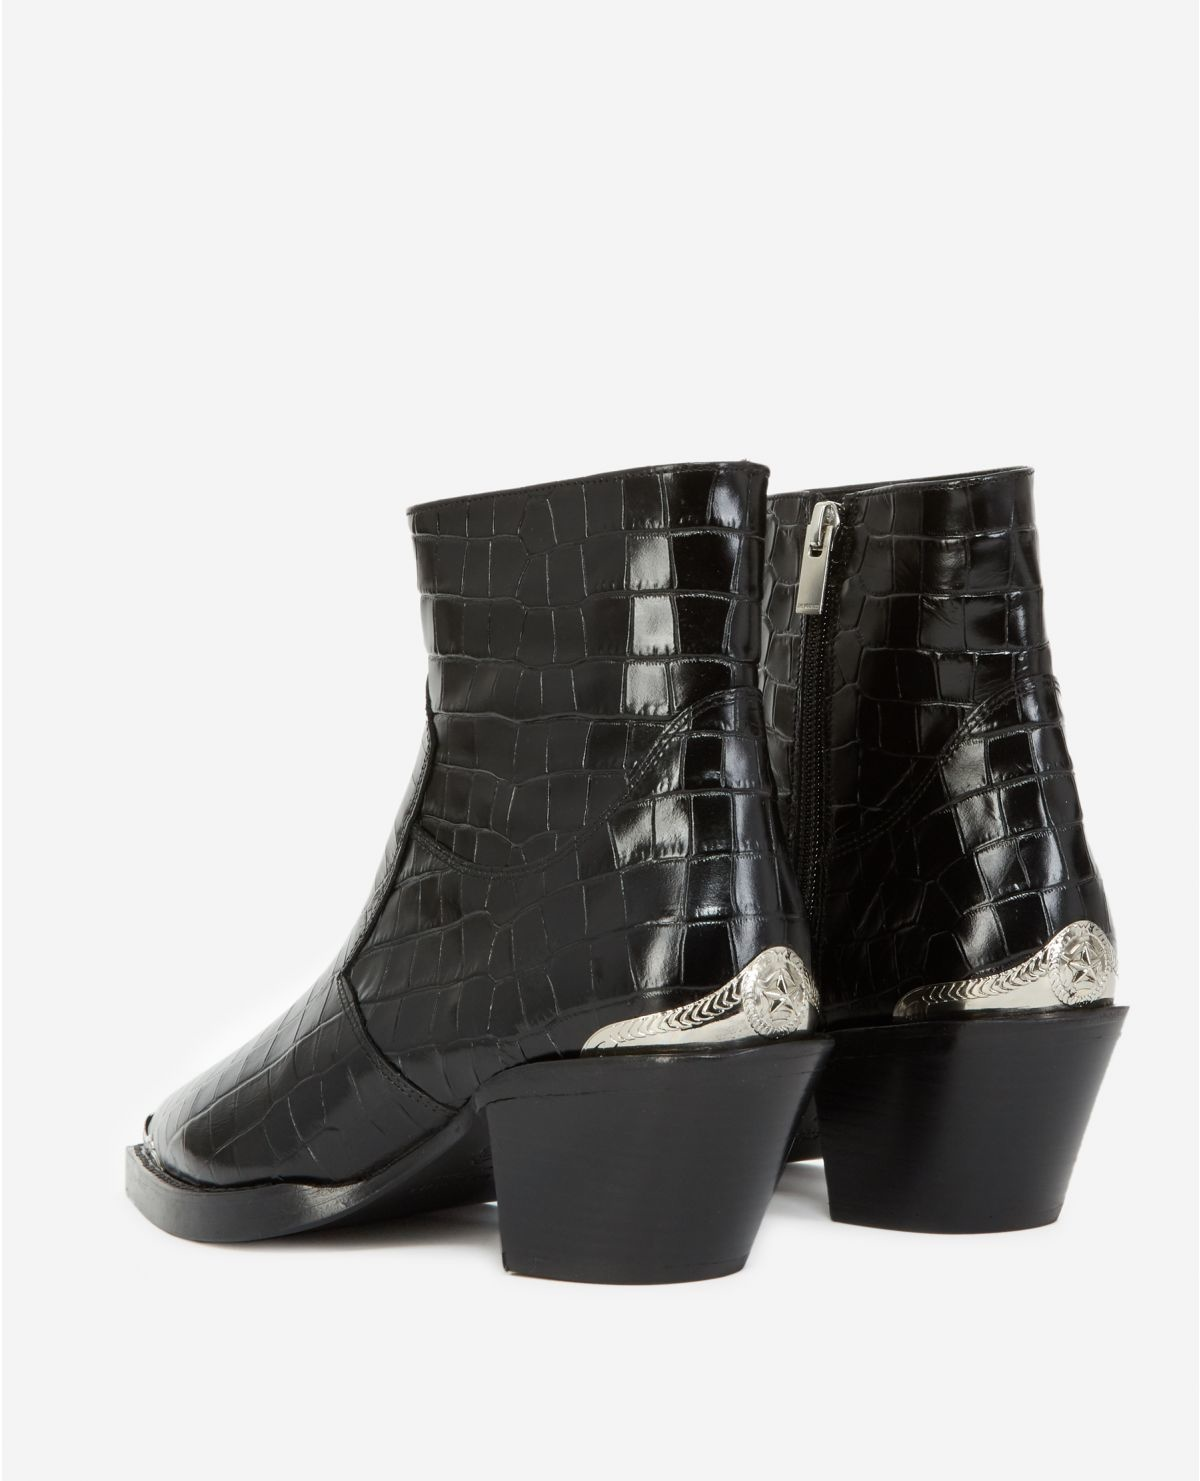 AFCHTHE KOOPLES bottines noires cuir façon croco21055K-5